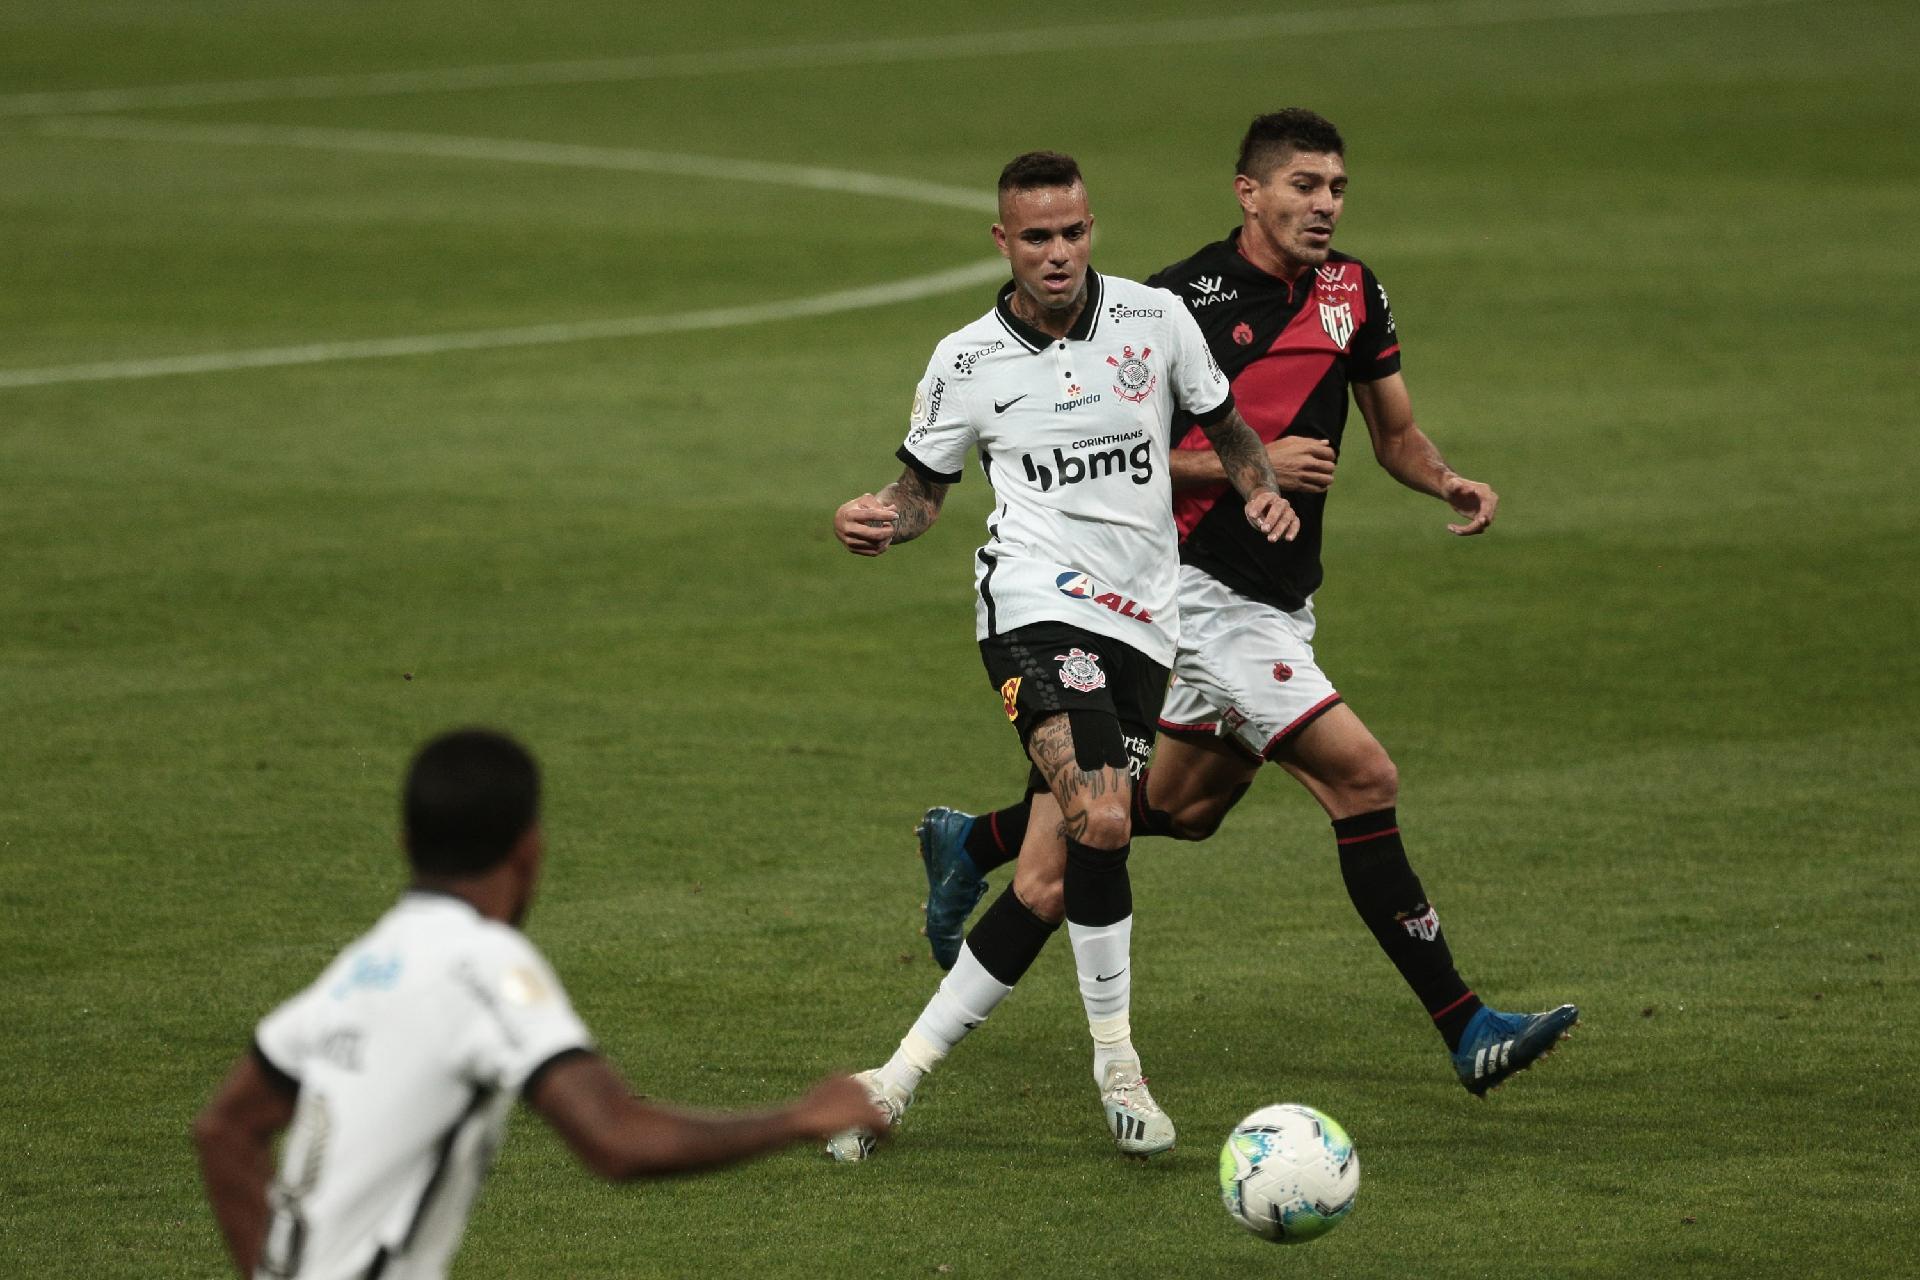 Atletico Go X Corinthians Local Horario Escalacao E Transmissao